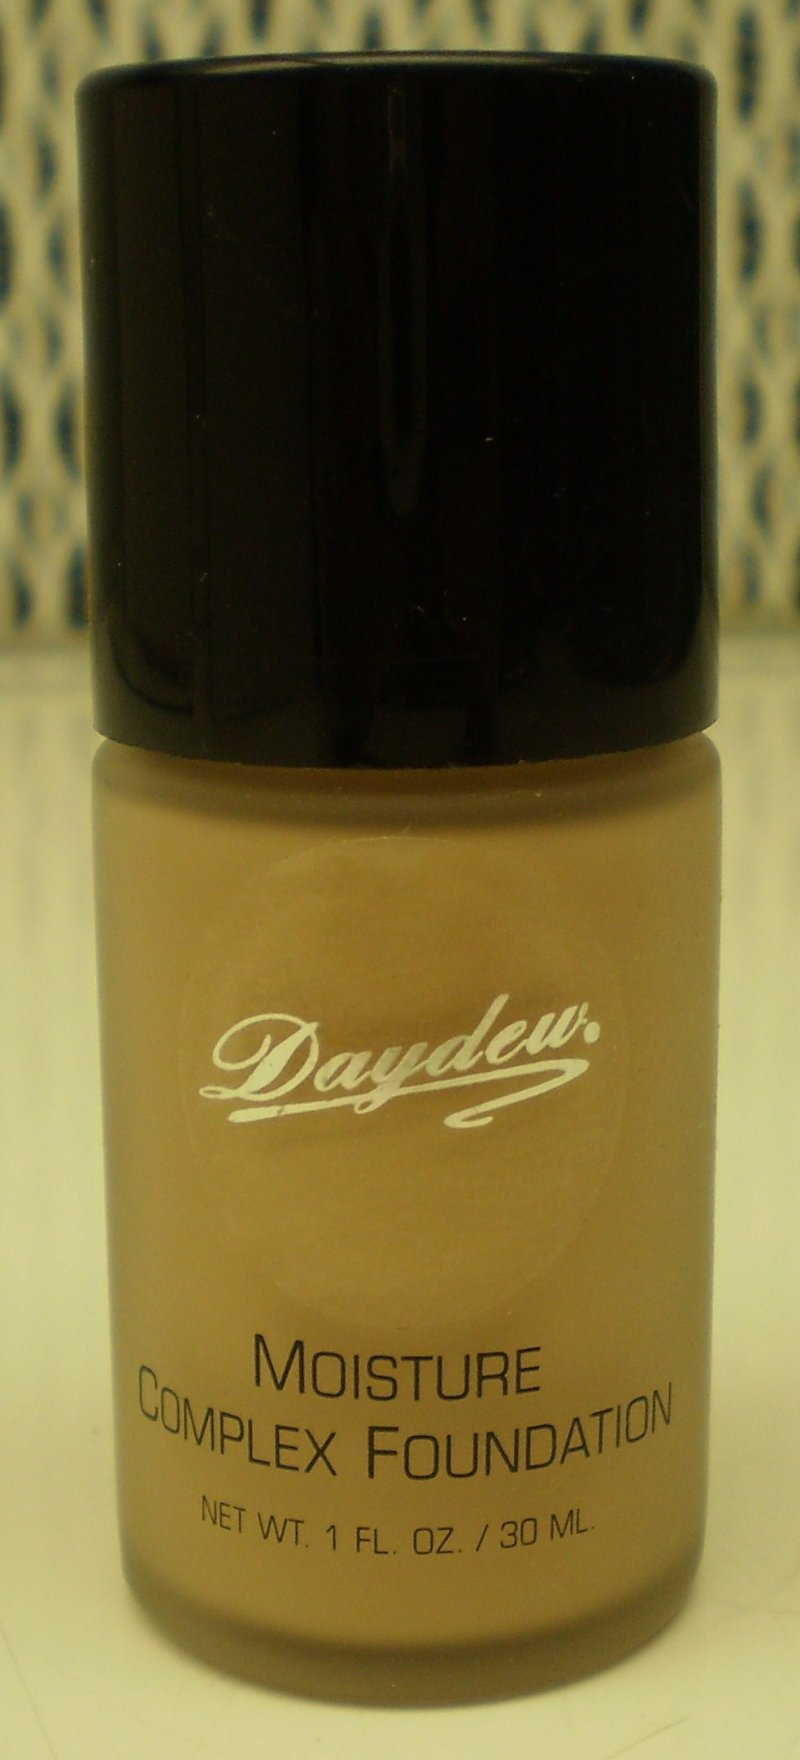 Daydew Custom Blend Moisture Complex Foundation Makeup Creme Beige 1oz